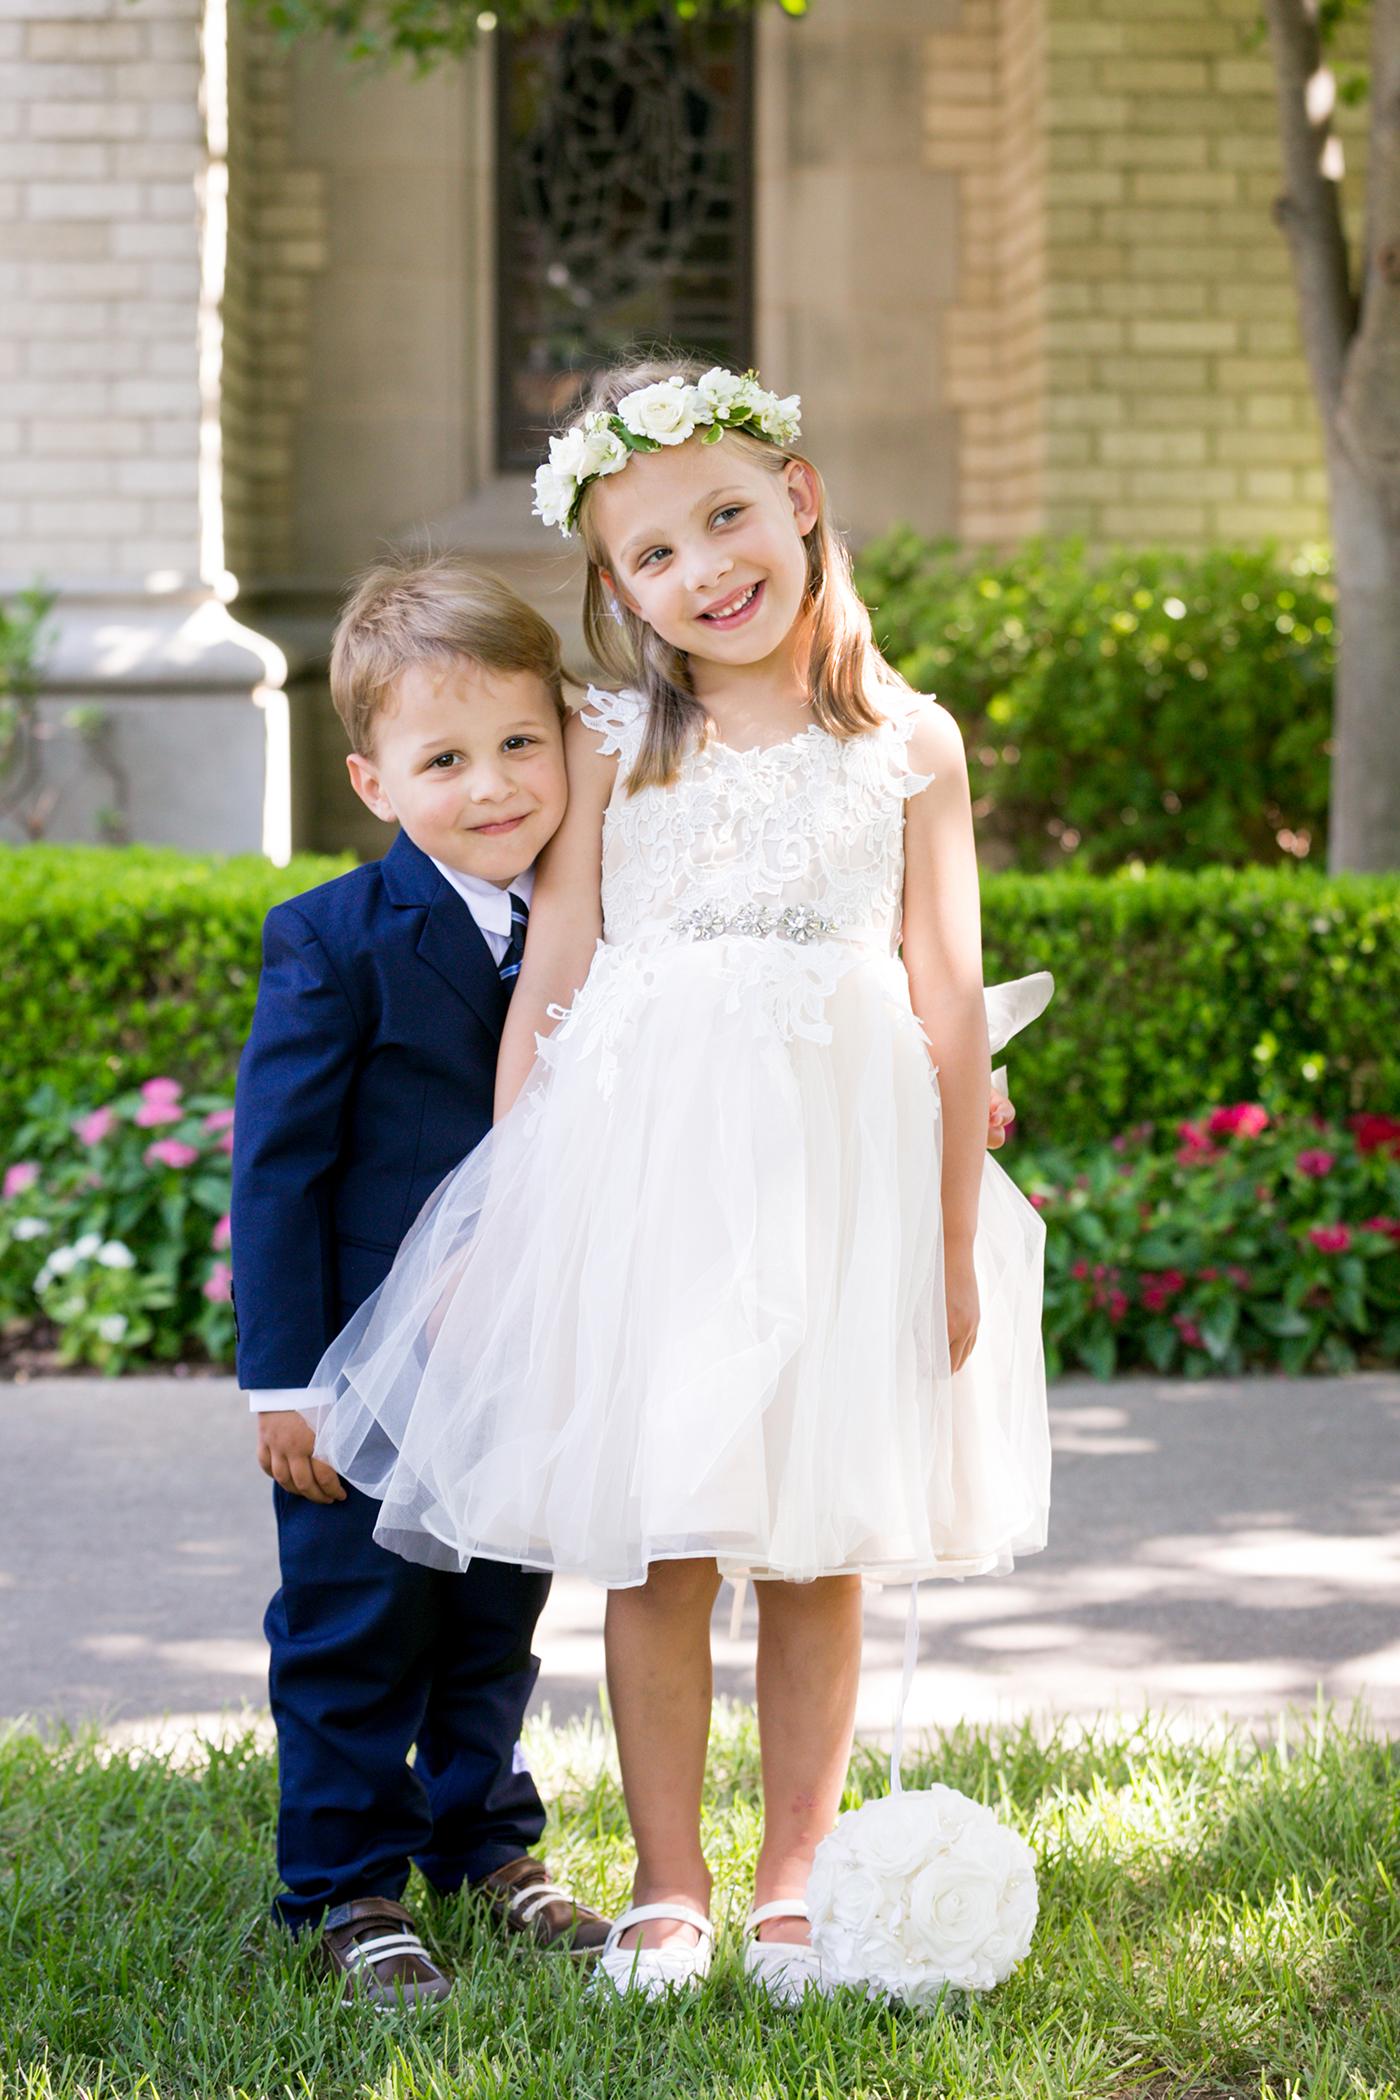 Wedding Planner Dallas TX - Allday Events - Highland Park - Marie Gabrielle Wedding - 213.jpg